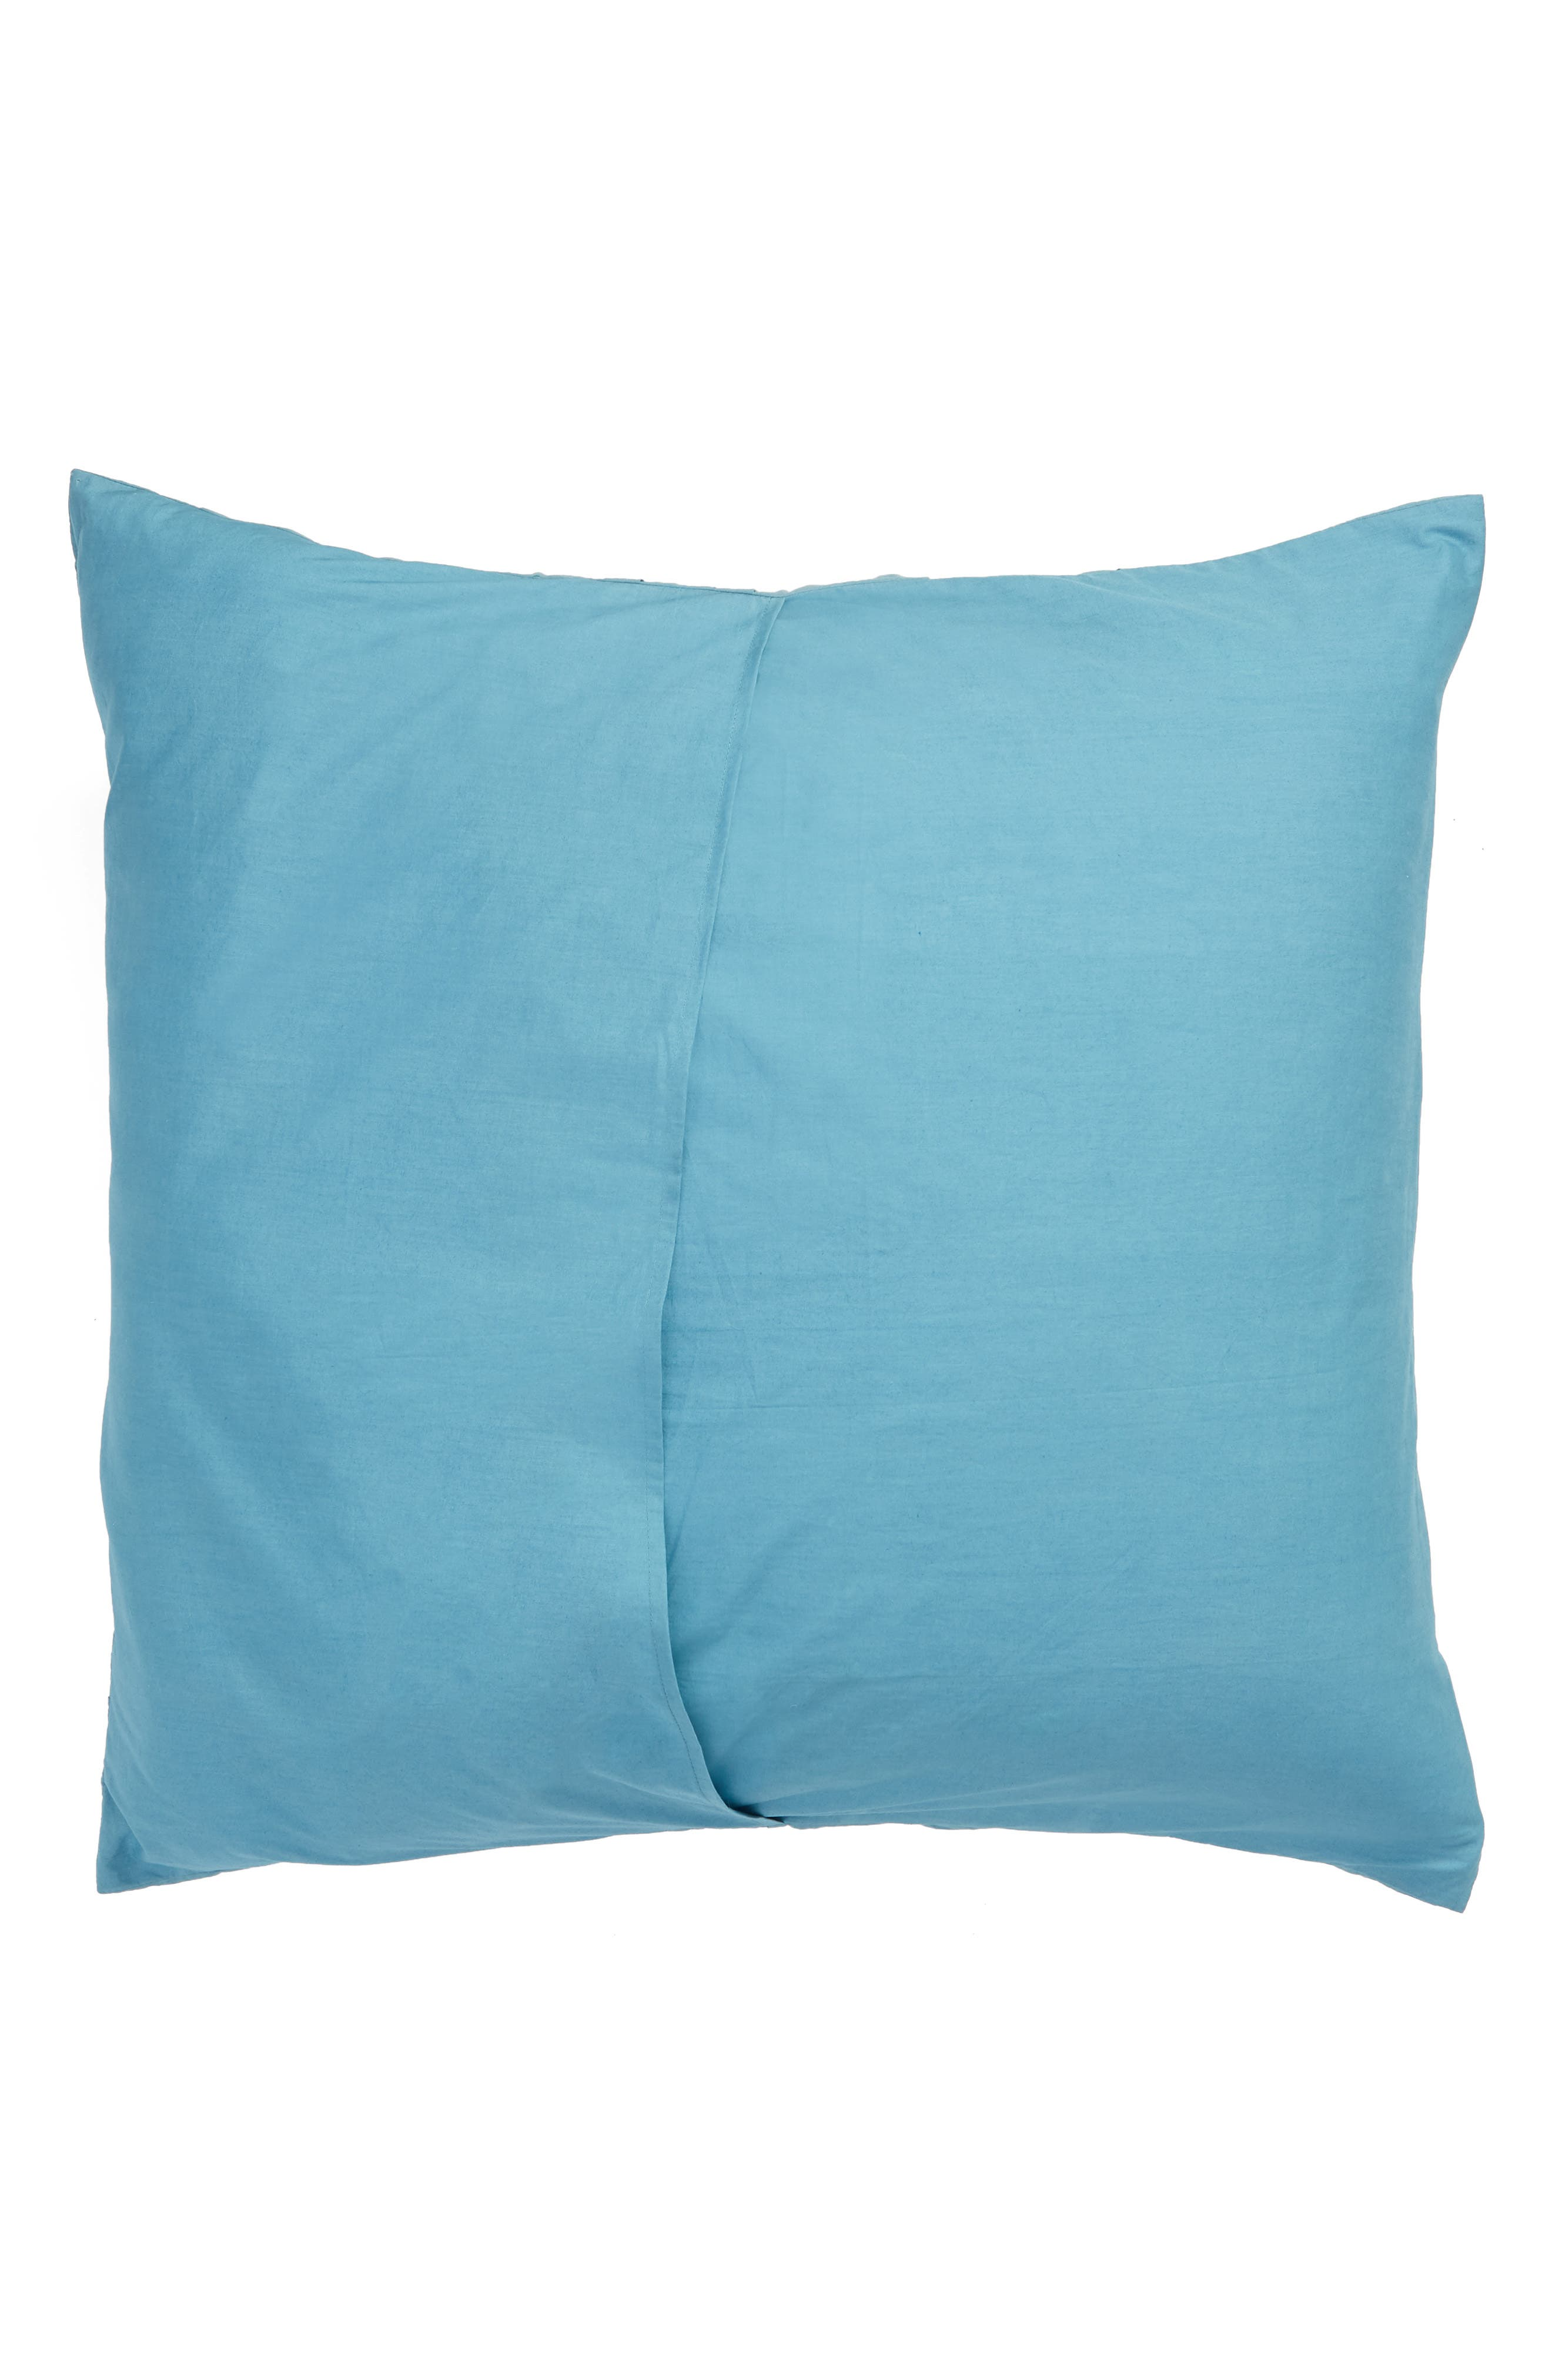 NORDSTROM AT HOME, 'Chloe' Euro Sham, Alternate thumbnail 2, color, BLUE ADRIATIC